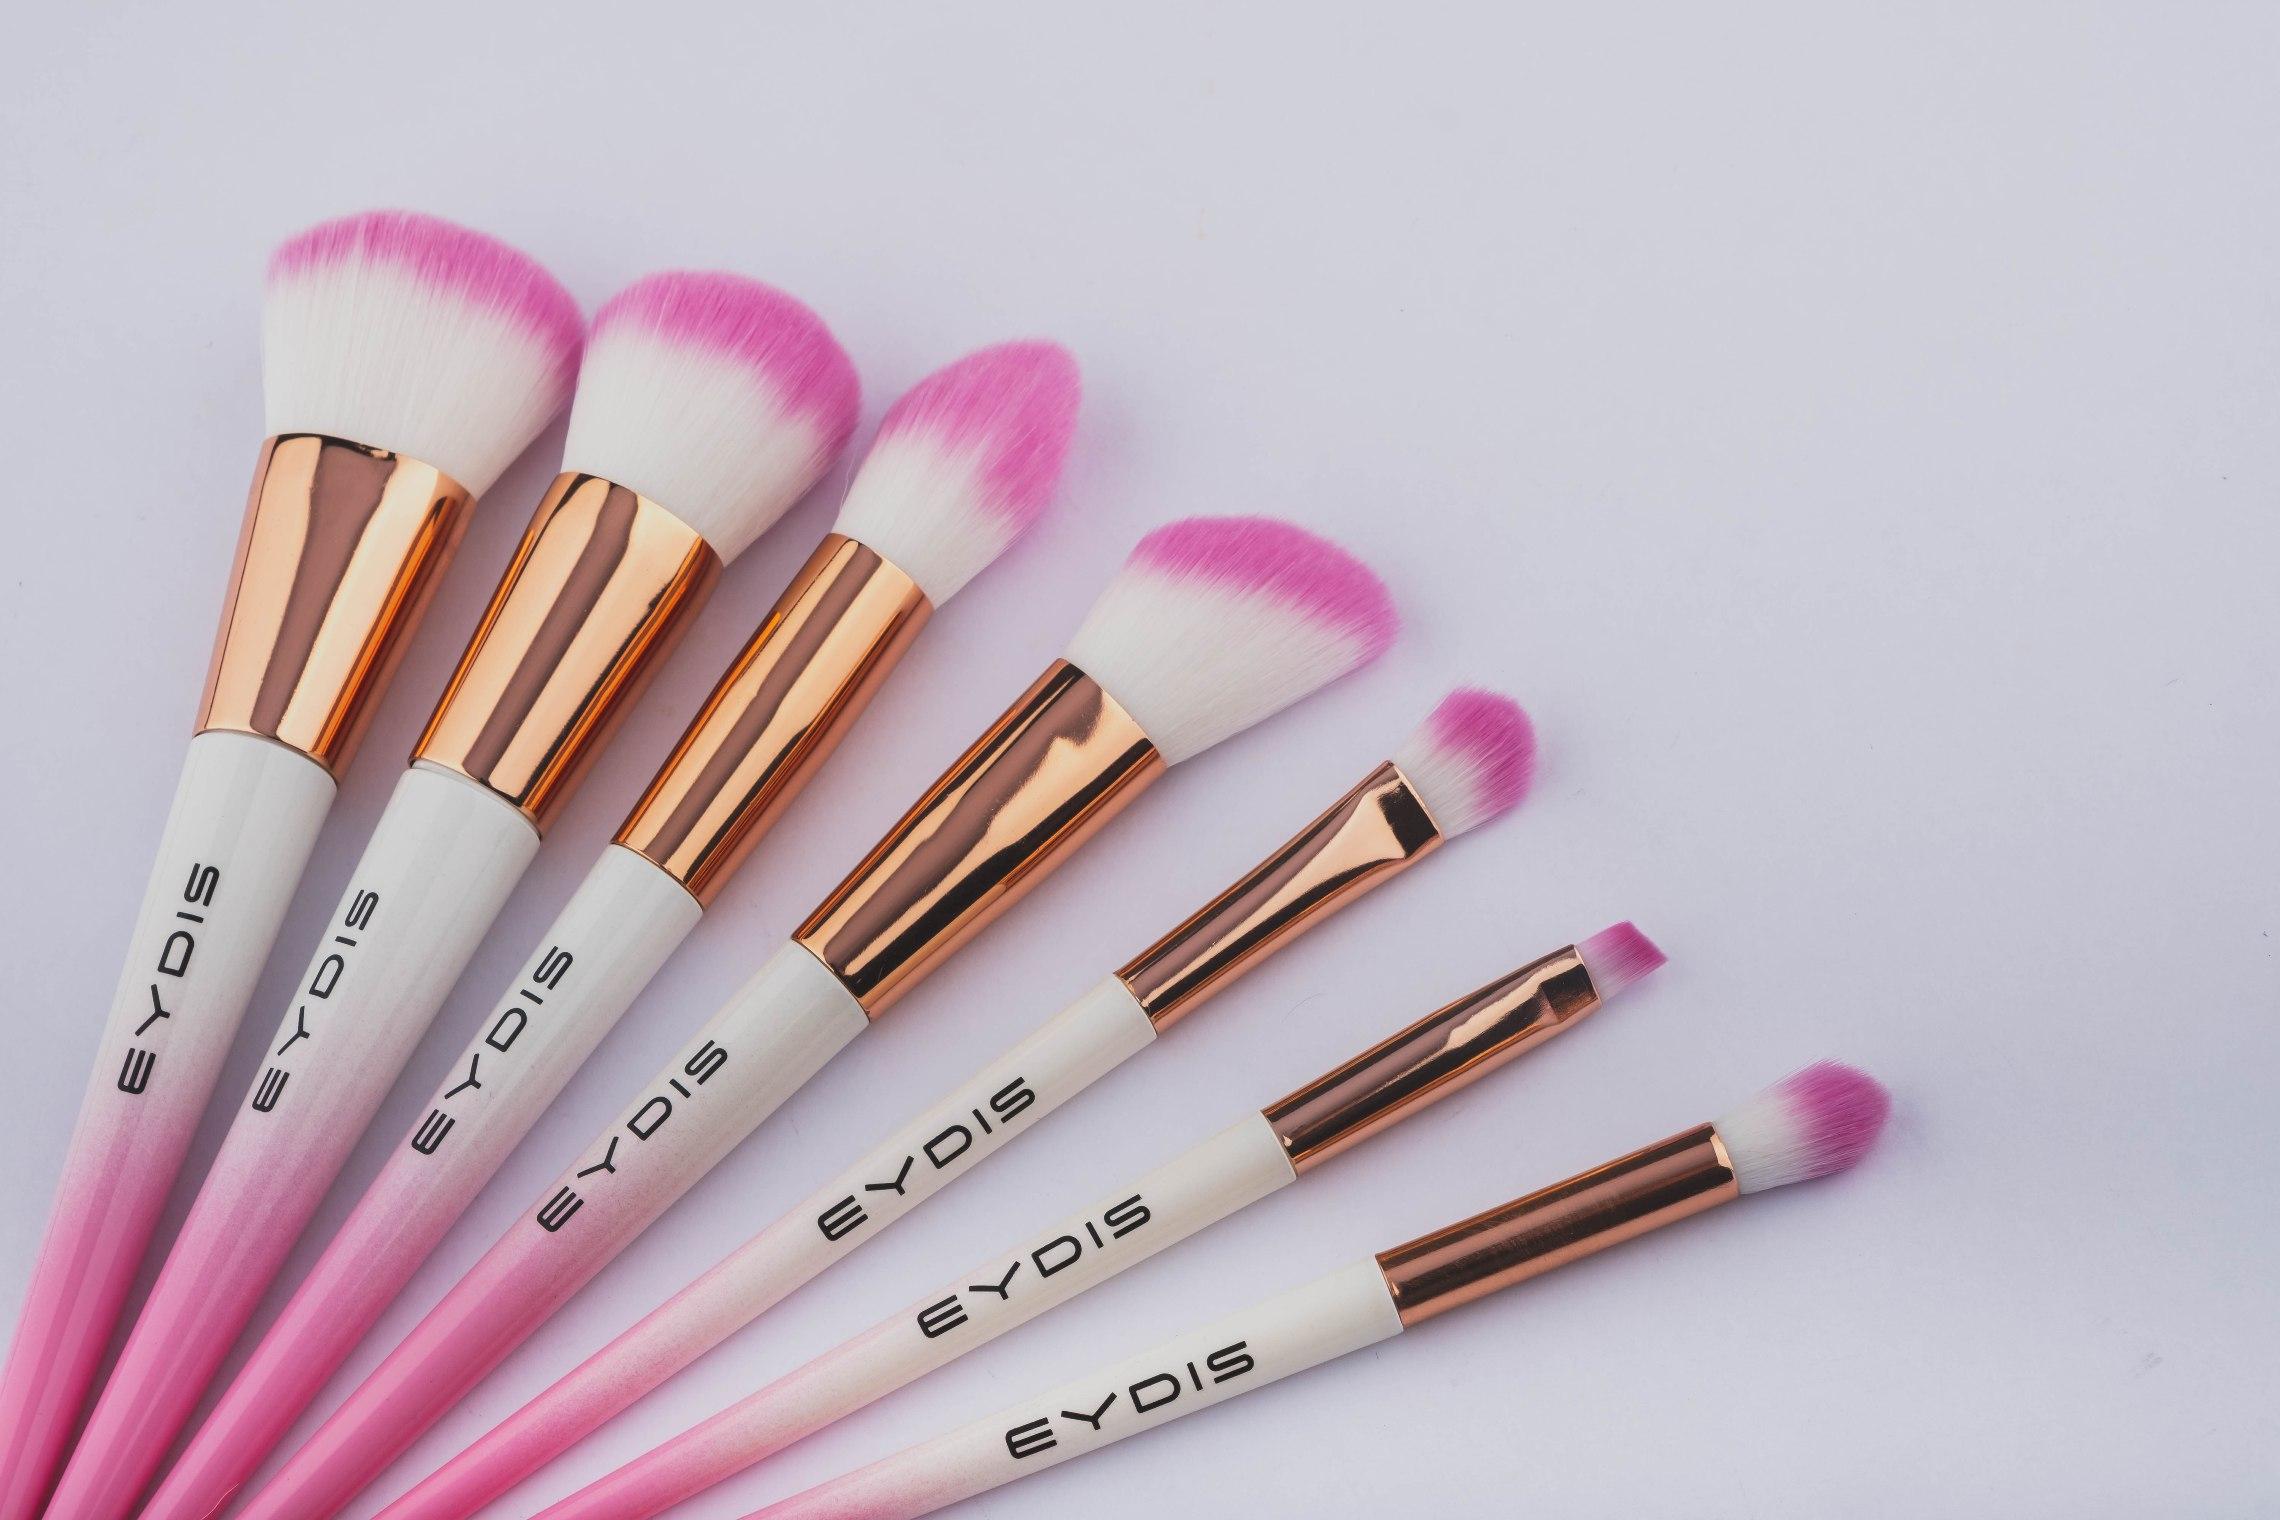 Make Up Brush Set - 7 Pieces